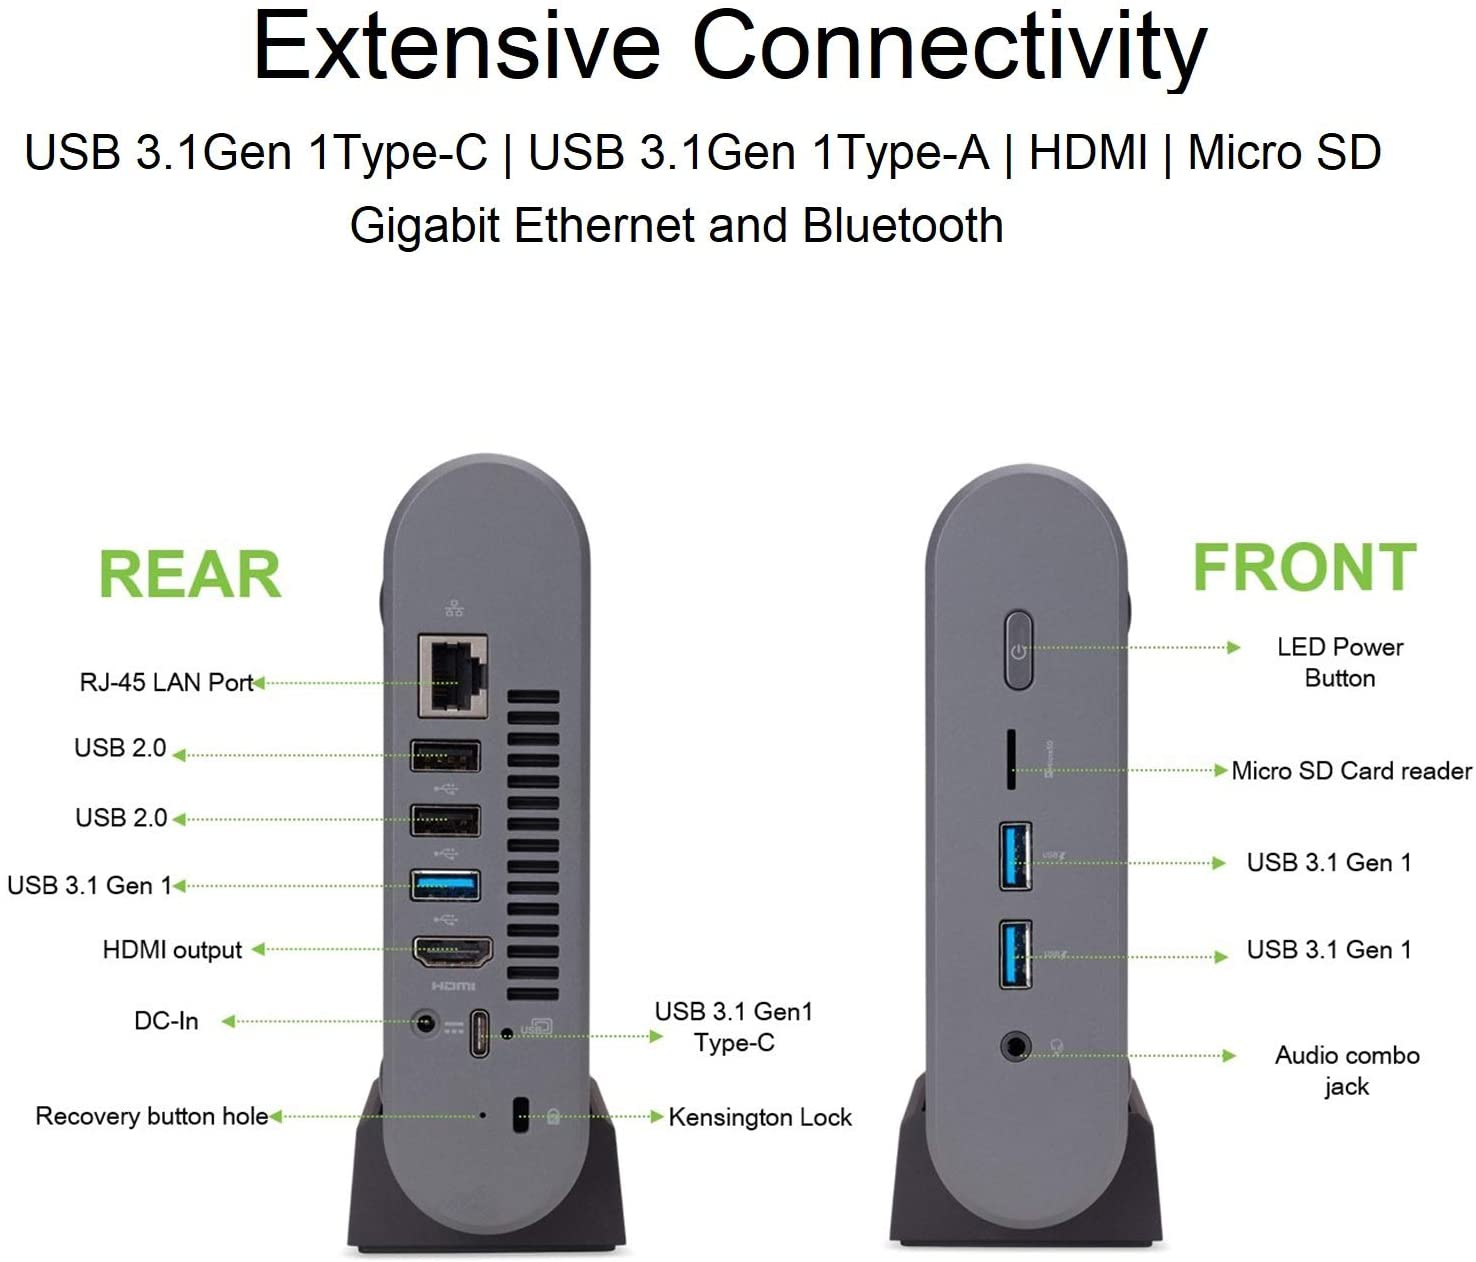 Acer Chromebox CXI3-UA91 Mini PC Connectivity